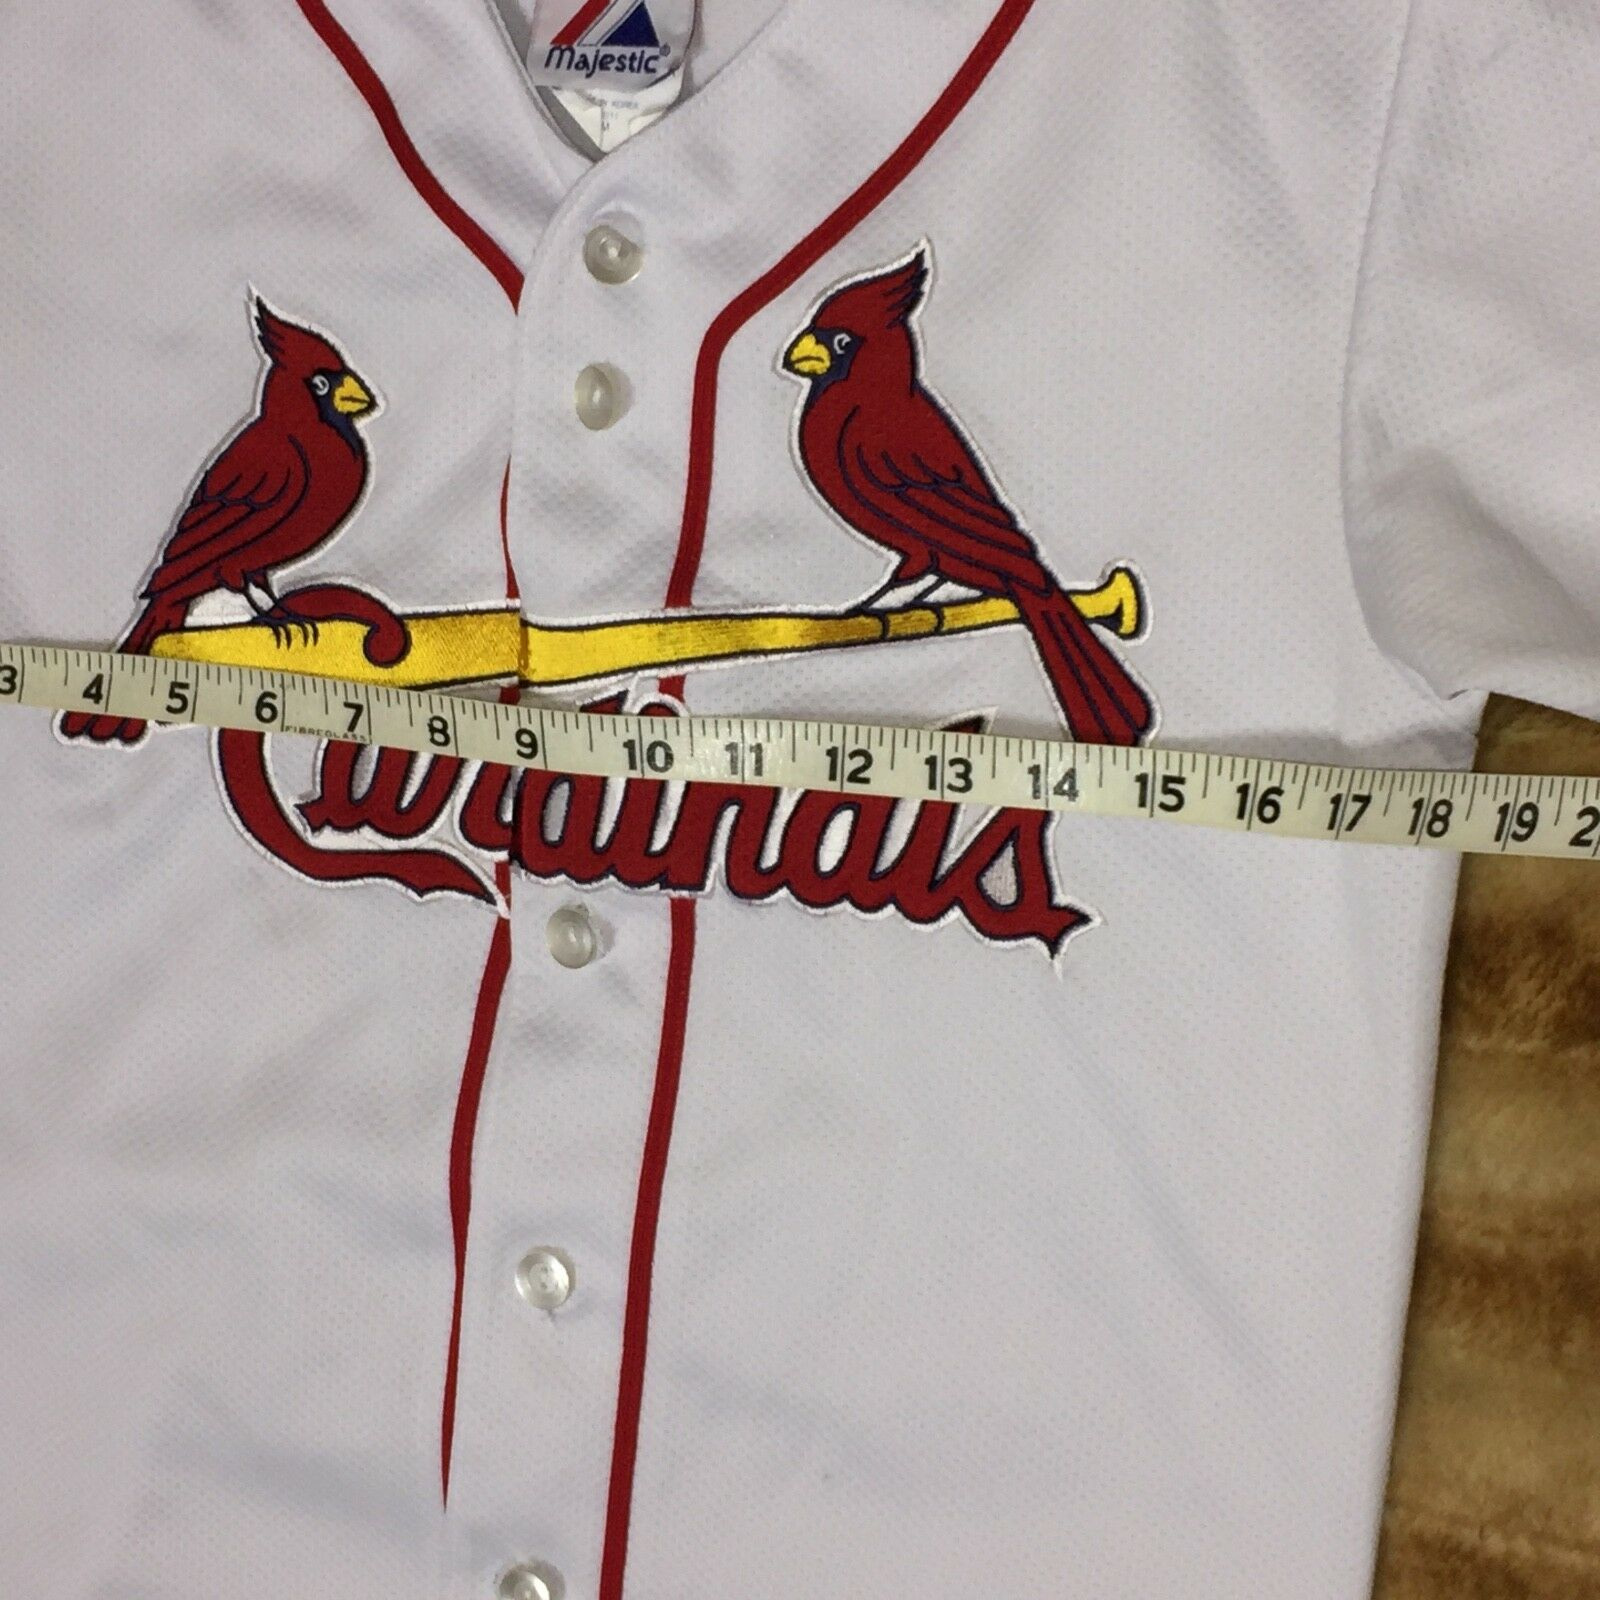 Majestic Weißes st Louis Cardinals Cool Cool Cool Base Custom 9e52e7